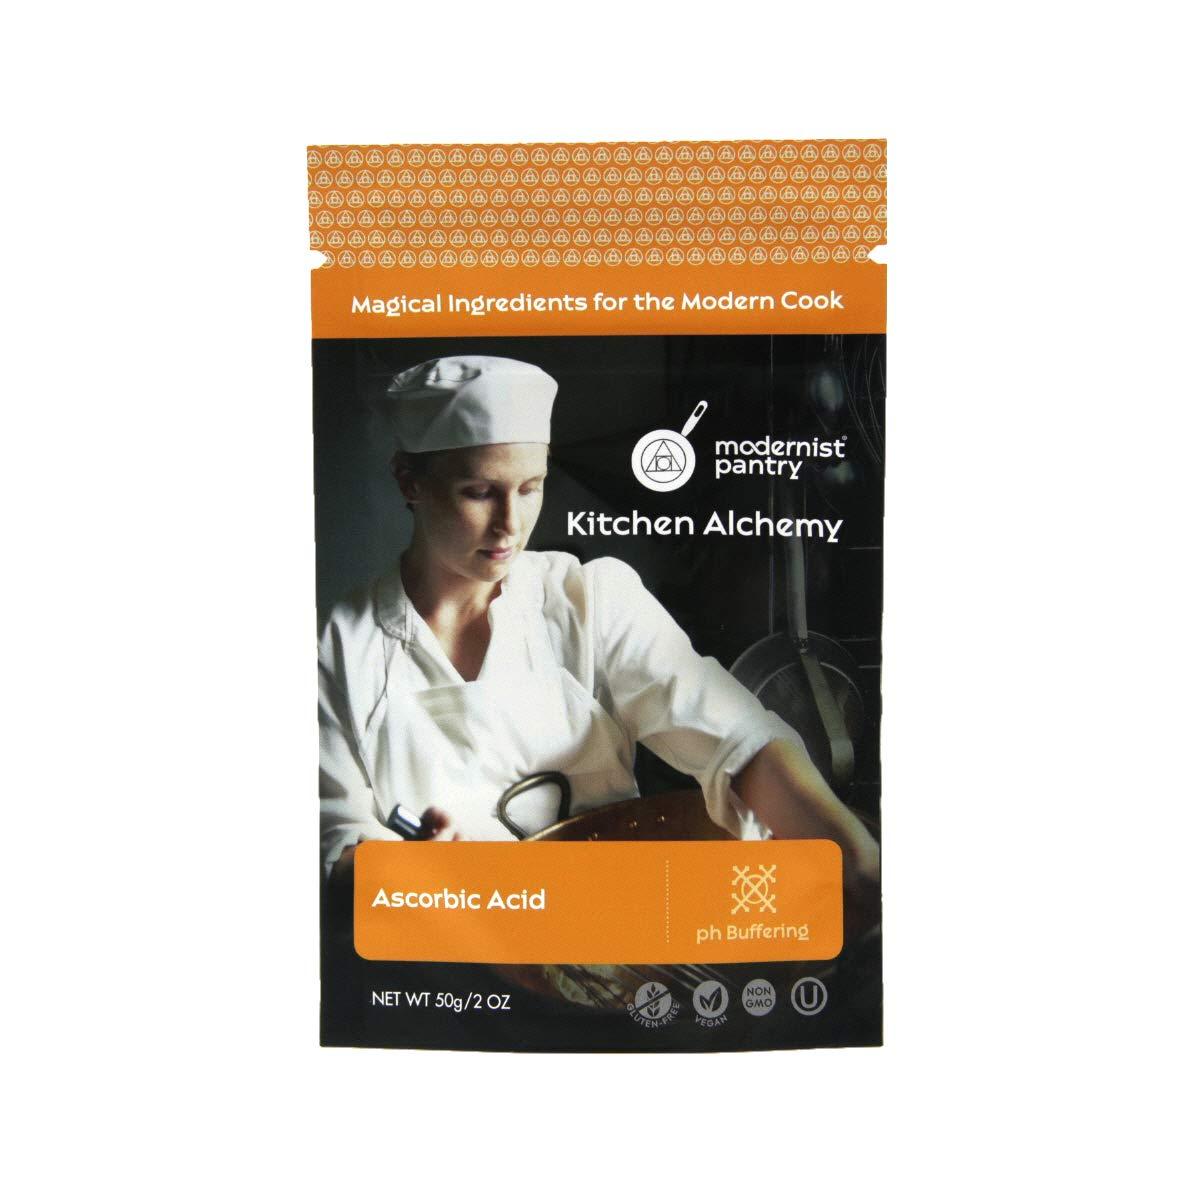 Pure Ascorbic Acid ⊘ Non-GMO ❤ Gluten-Free ☮ Vegan ✡ OU Kosher Certified - 50g/2oz